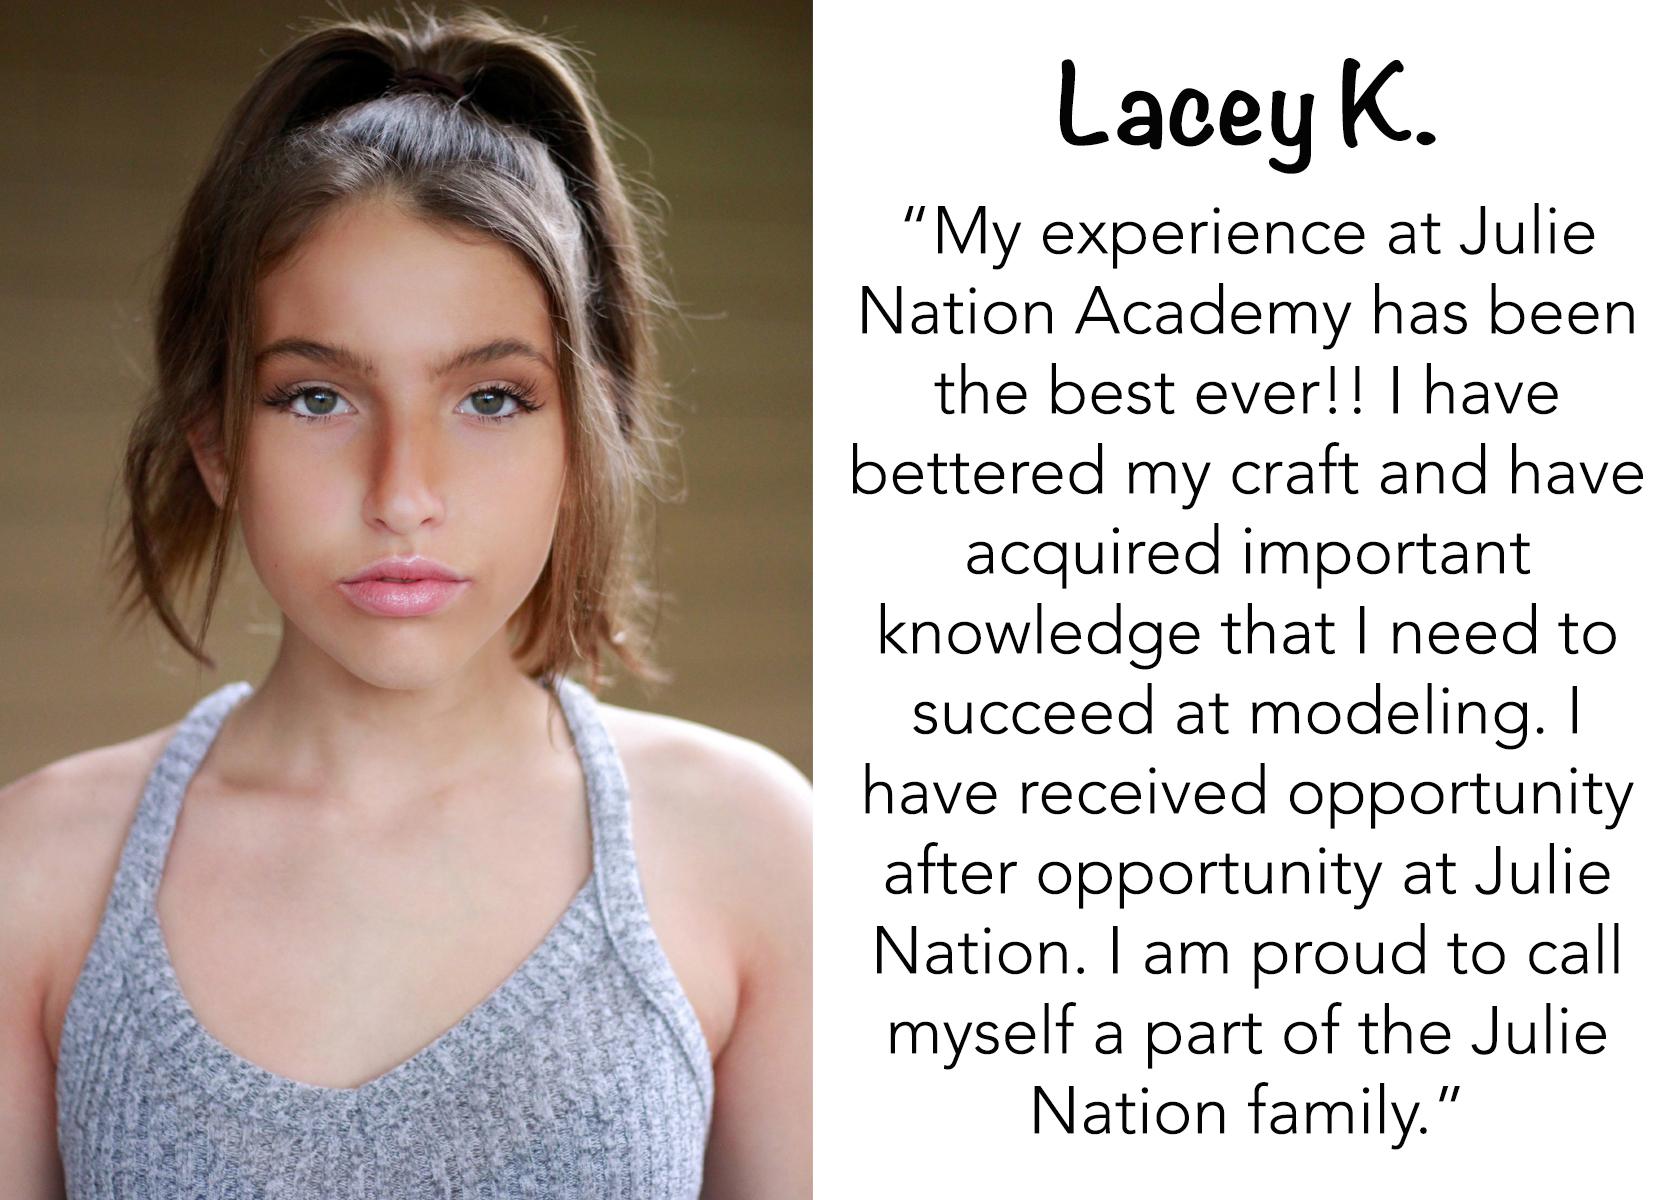 Lacey Koch